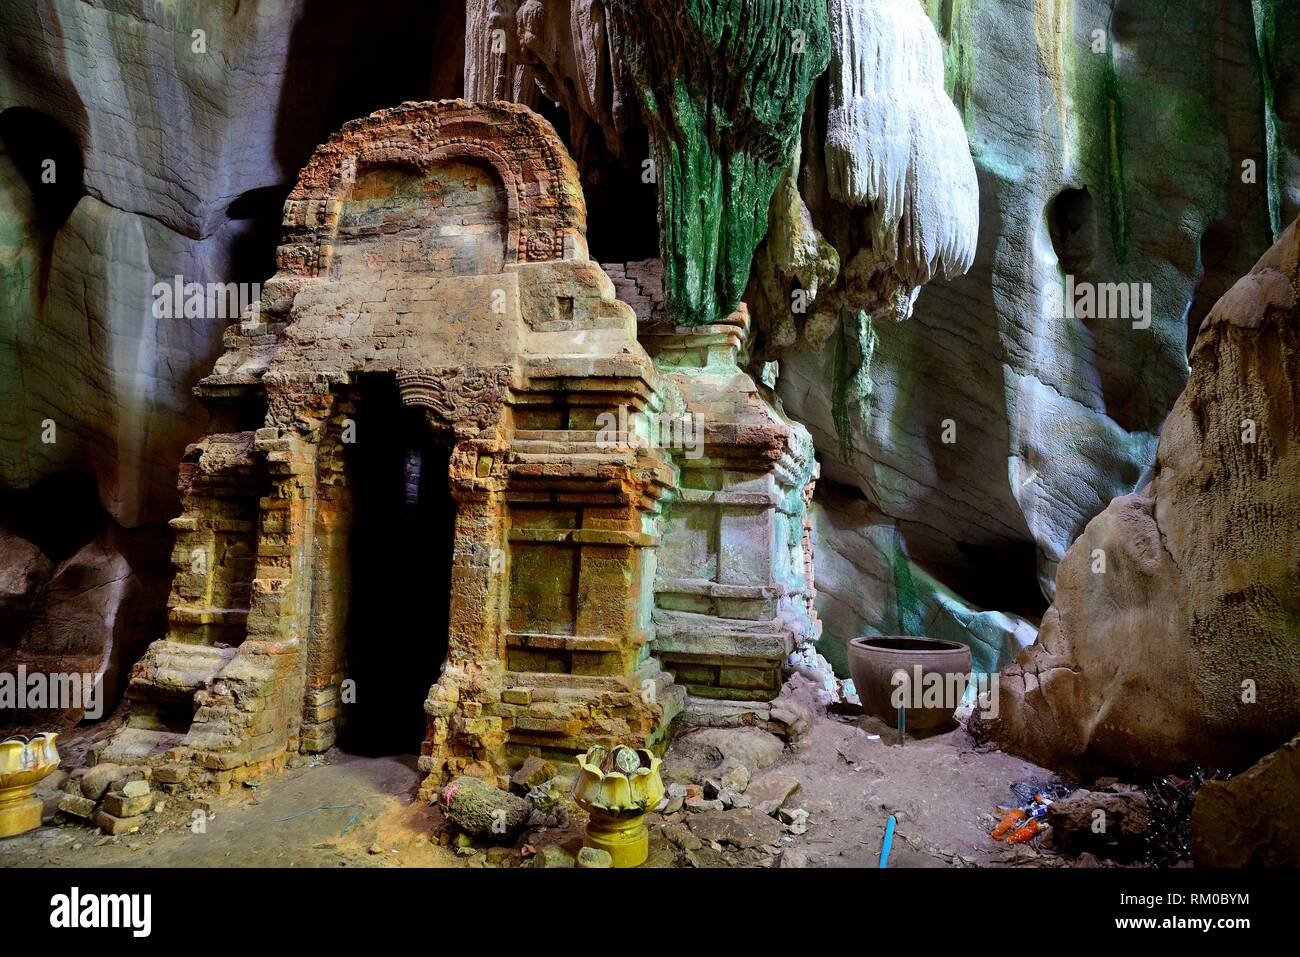 Pre-Angkorian prasat in Phnom Chhngok cave, Kampot province, Cambodia - Stock Image